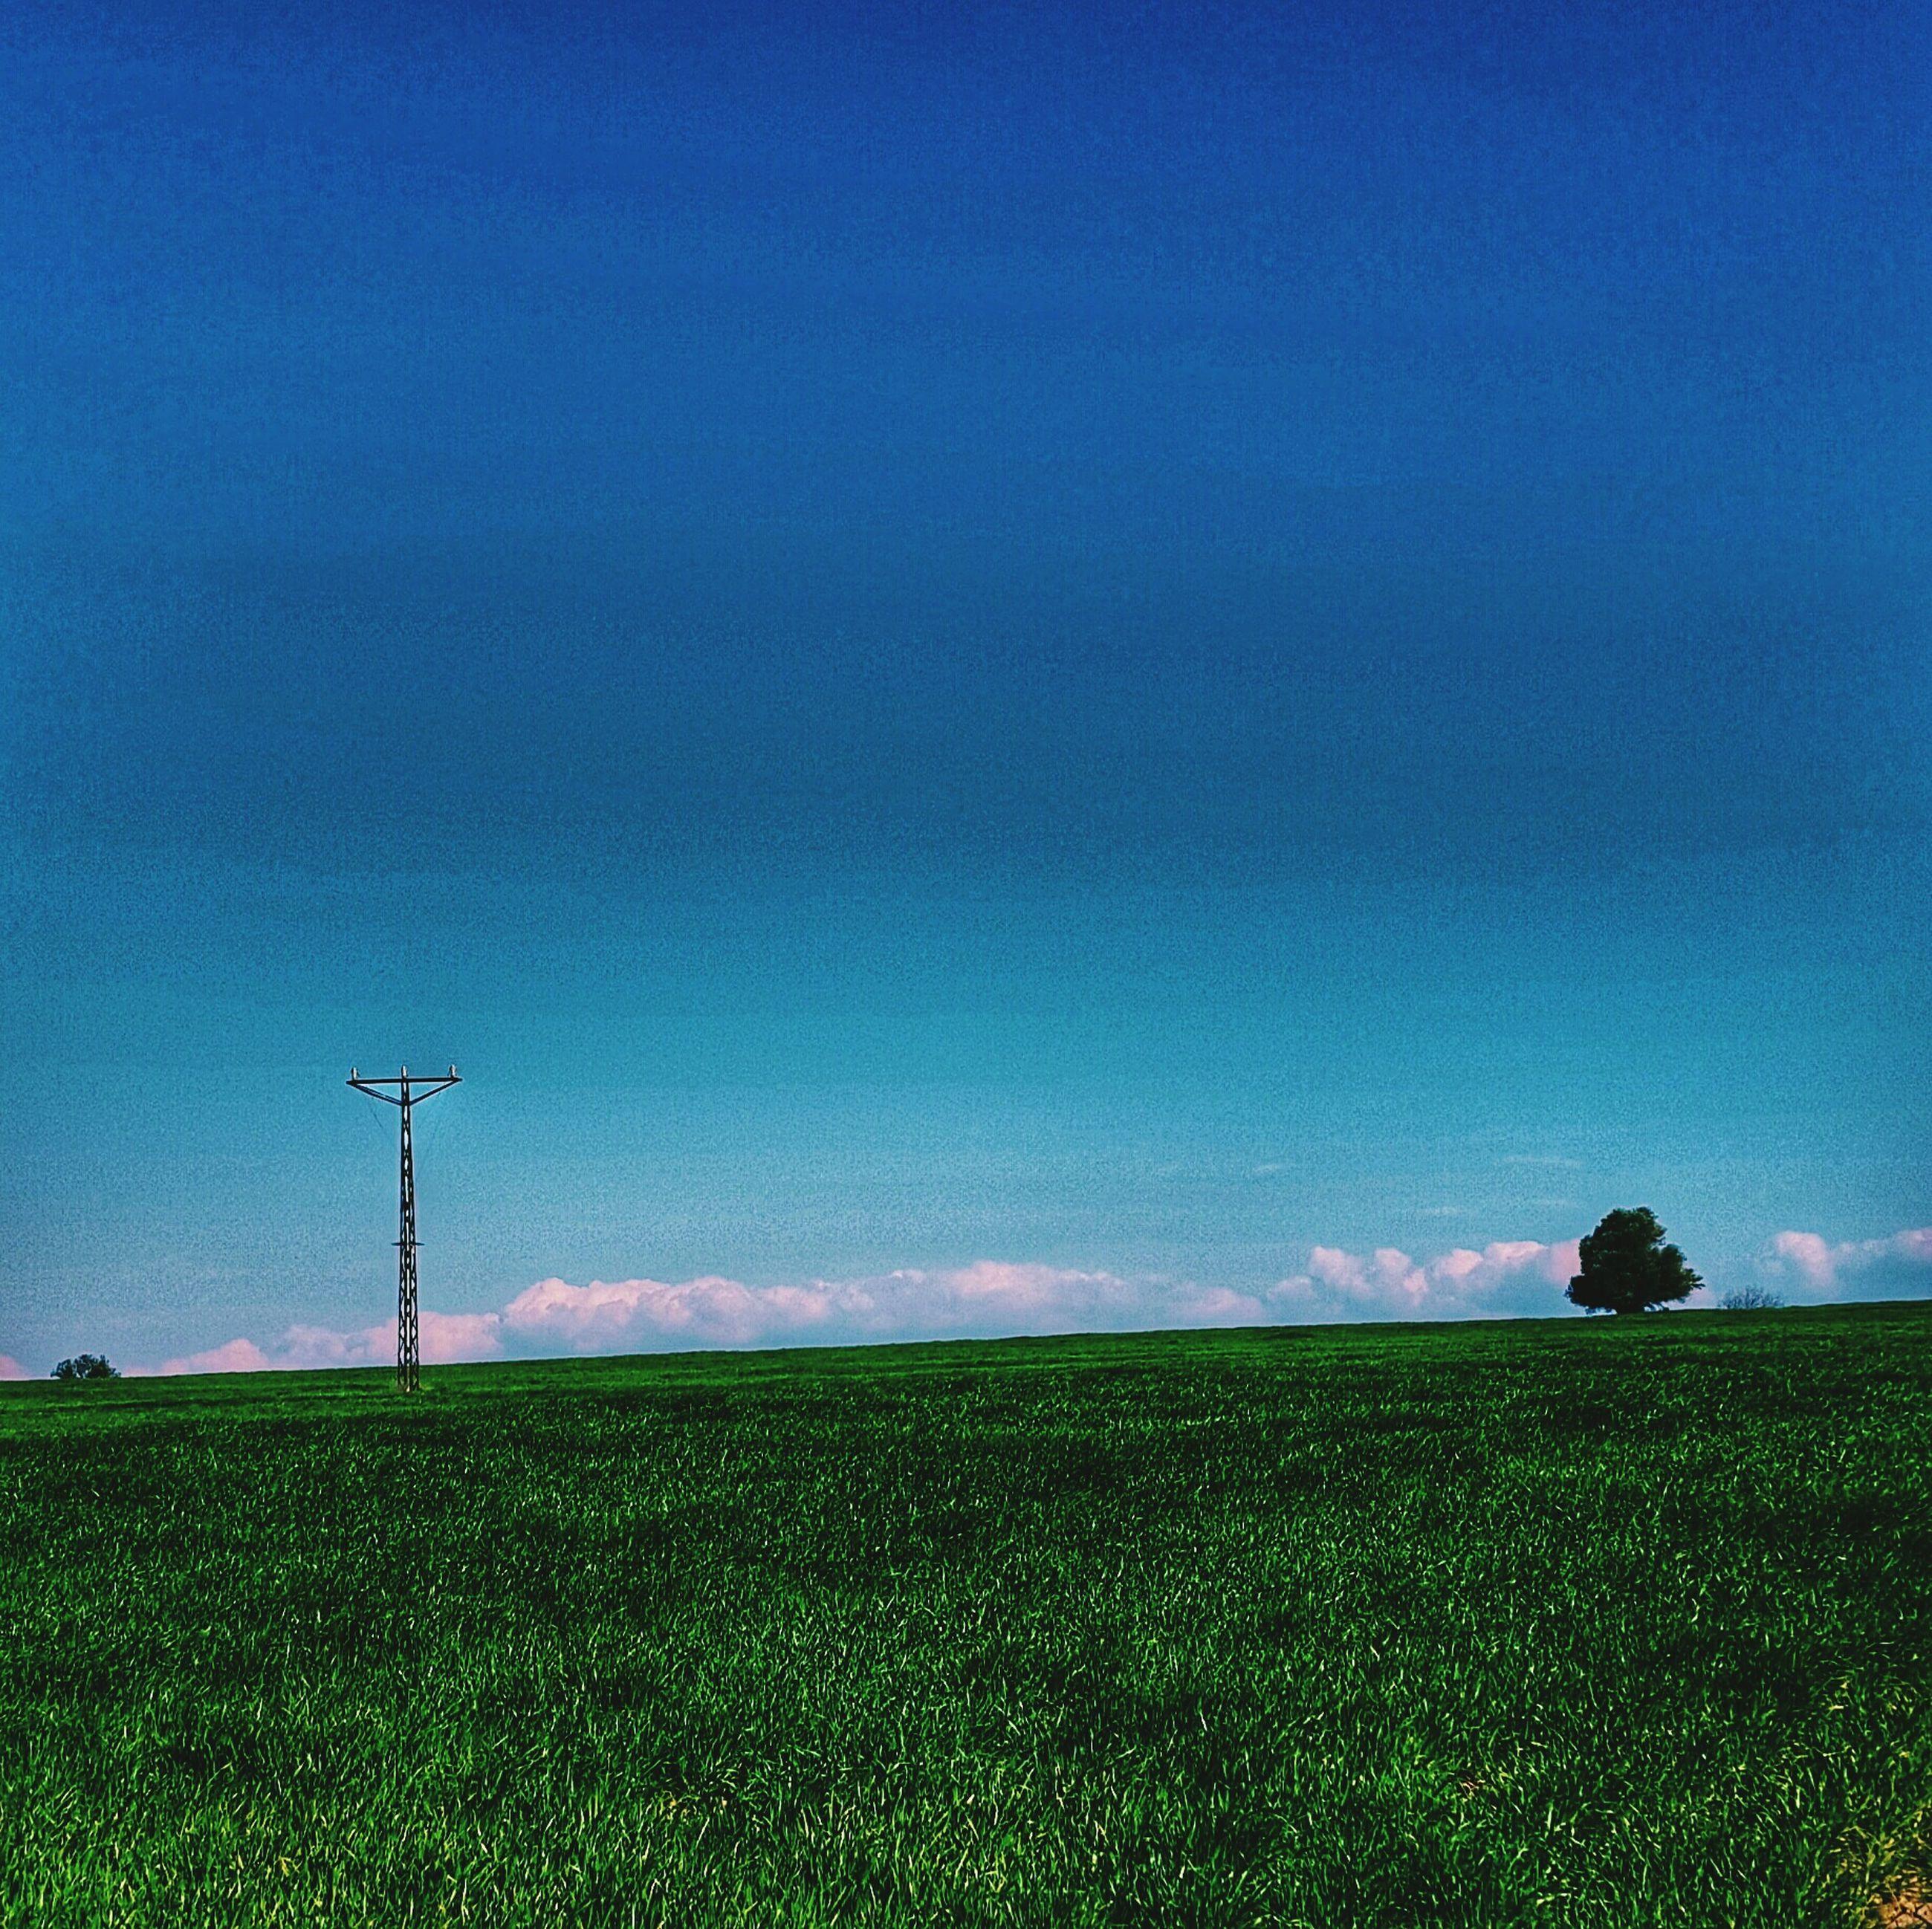 landscape, blue, field, tranquility, tranquil scene, grass, scenics, copy space, beauty in nature, sky, nature, clear sky, grassy, rural scene, wind power, remote, non-urban scene, green color, idyllic, wind turbine